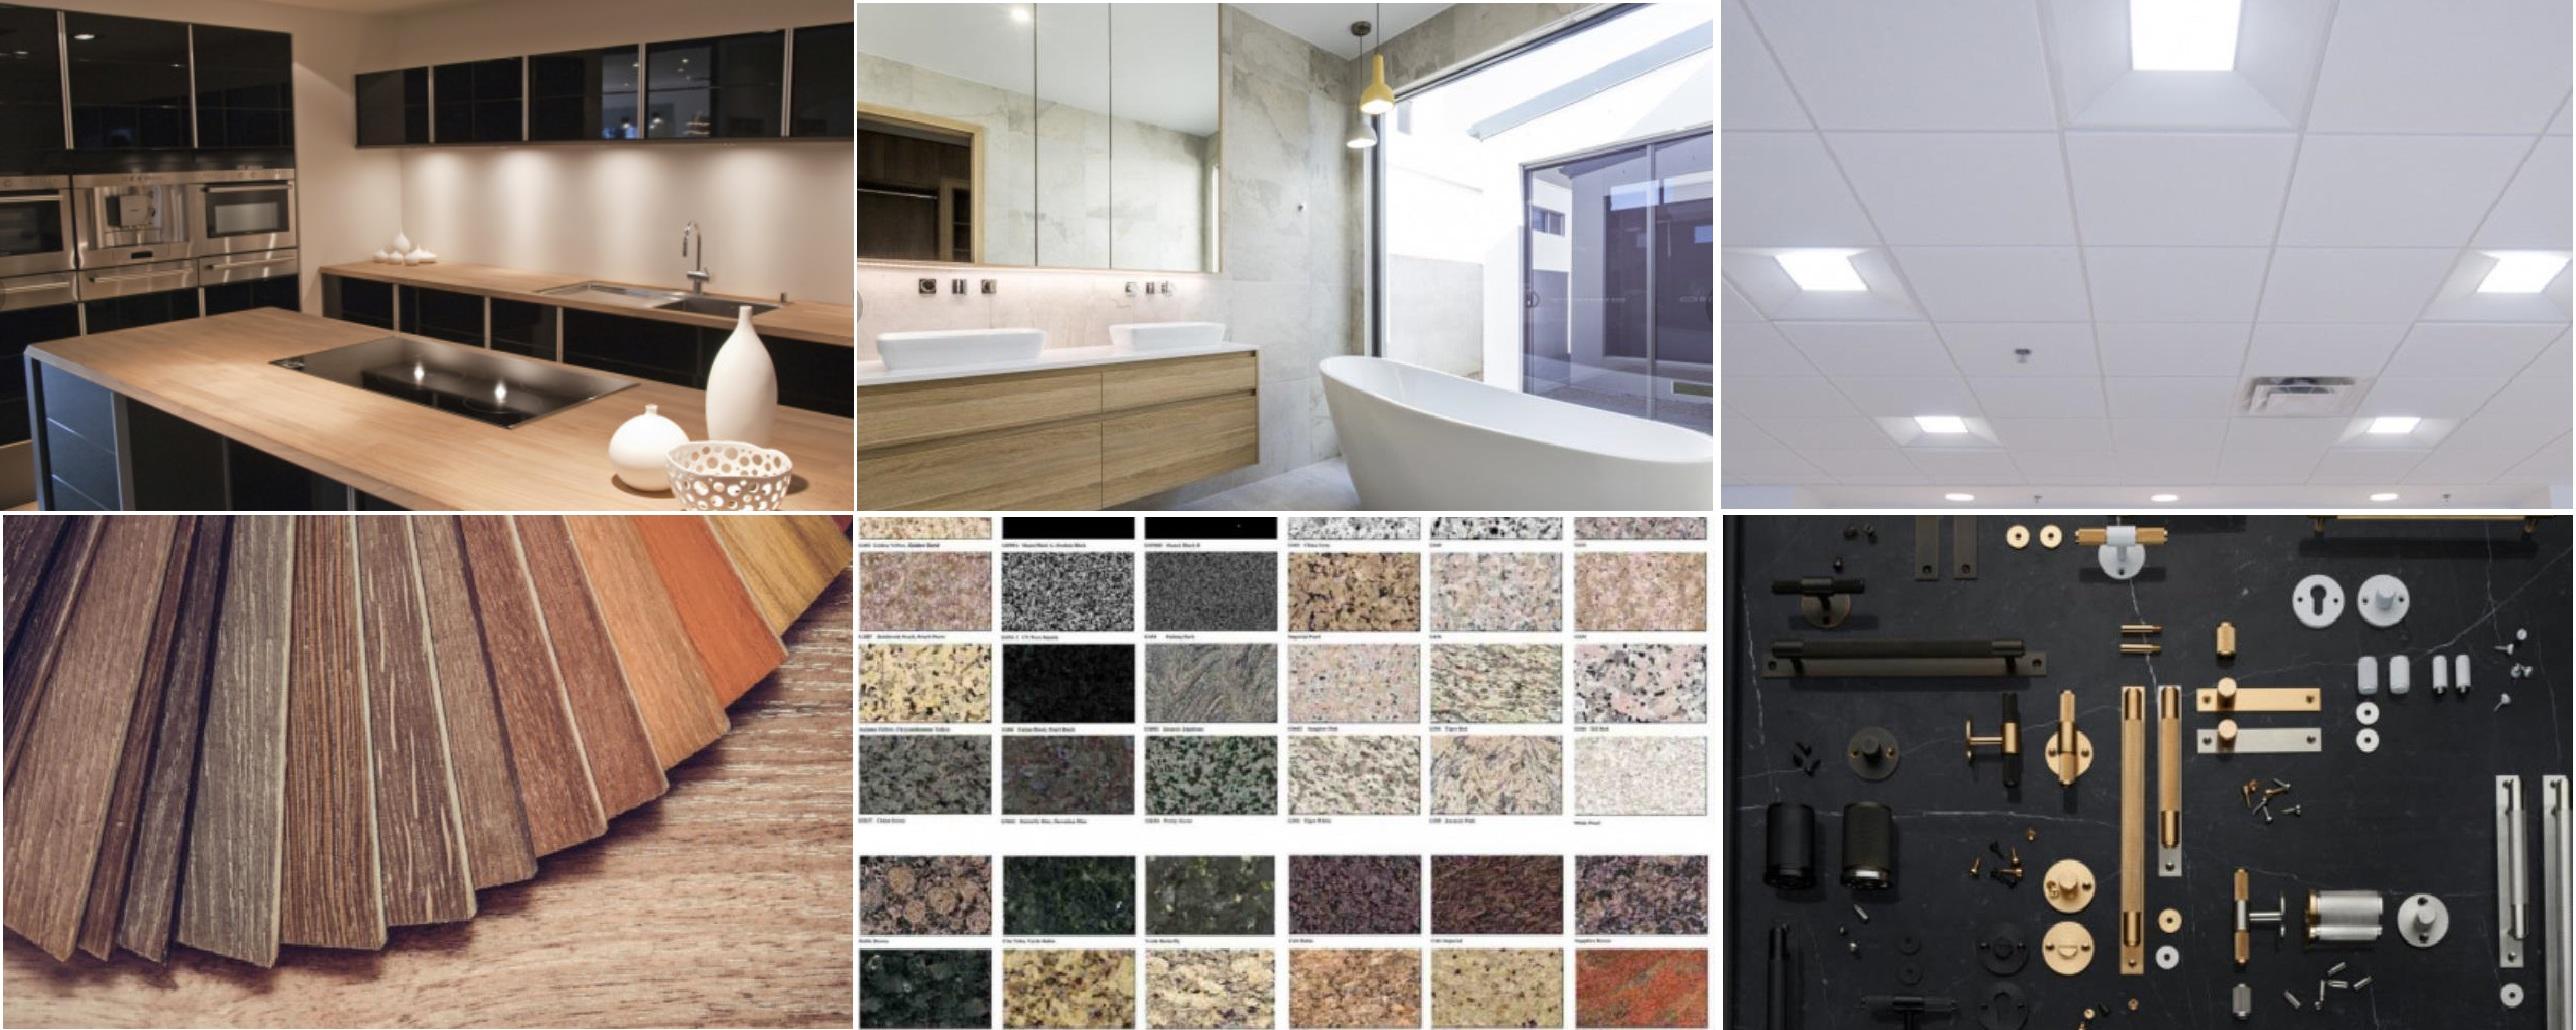 Dunbon Provides Procurement Projects. Interior Materials:Floor/Lighting, etc.